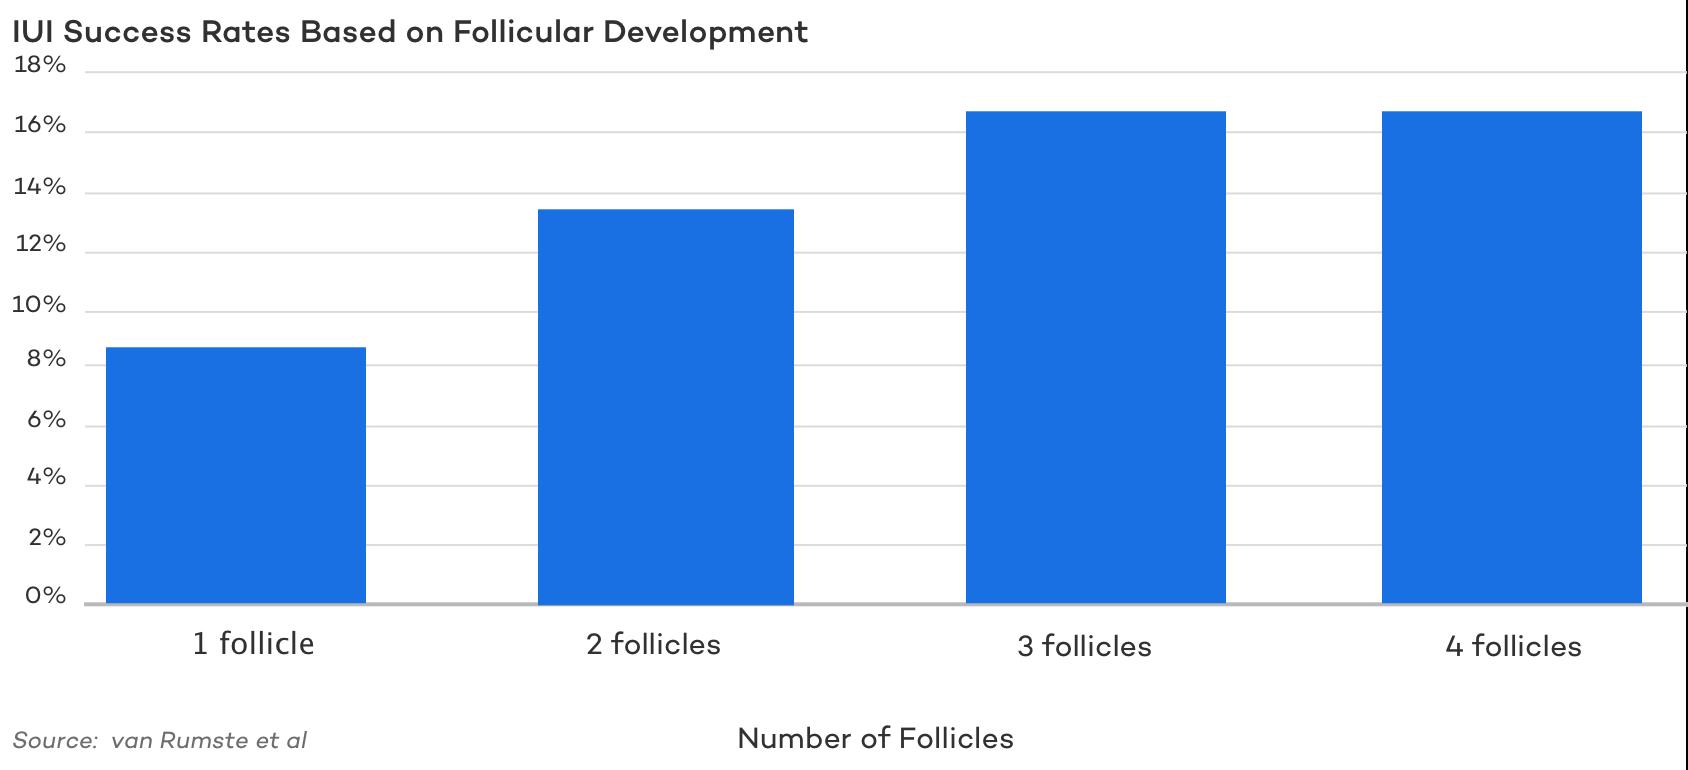 IUI Success Rates Based on Follicular Development